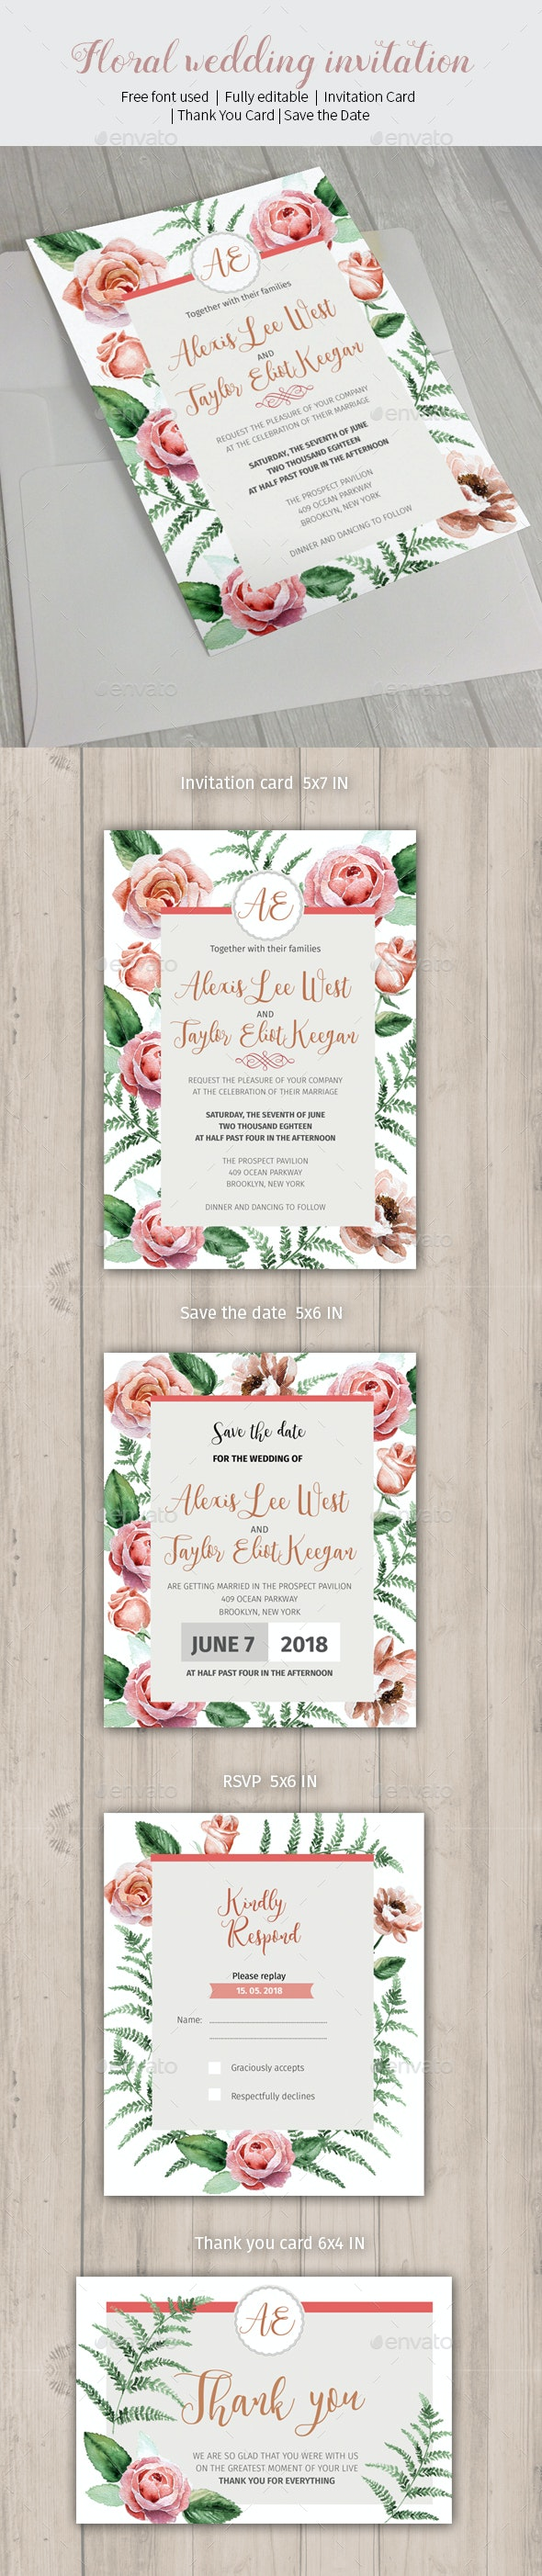 Floral wedding invitation - Weddings Cards & Invites